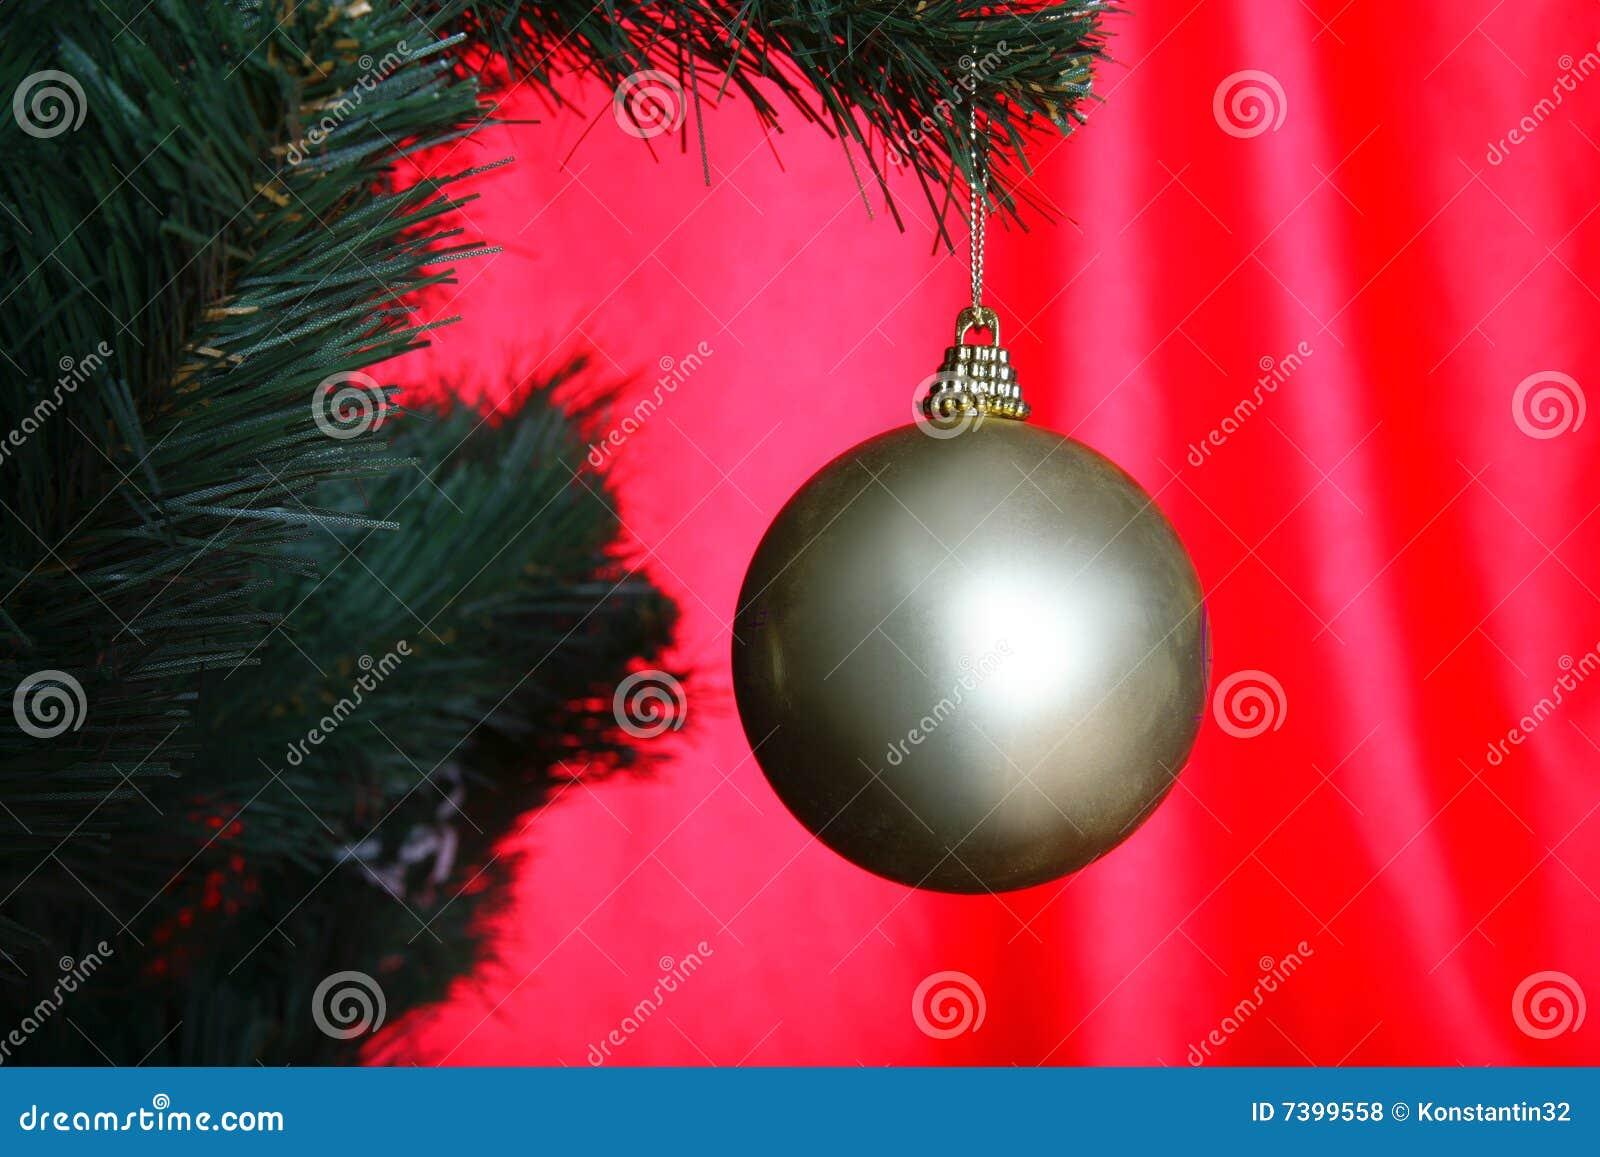 Christmas Tree Ball Placement : Christmas tree with ball royalty free stock photos image